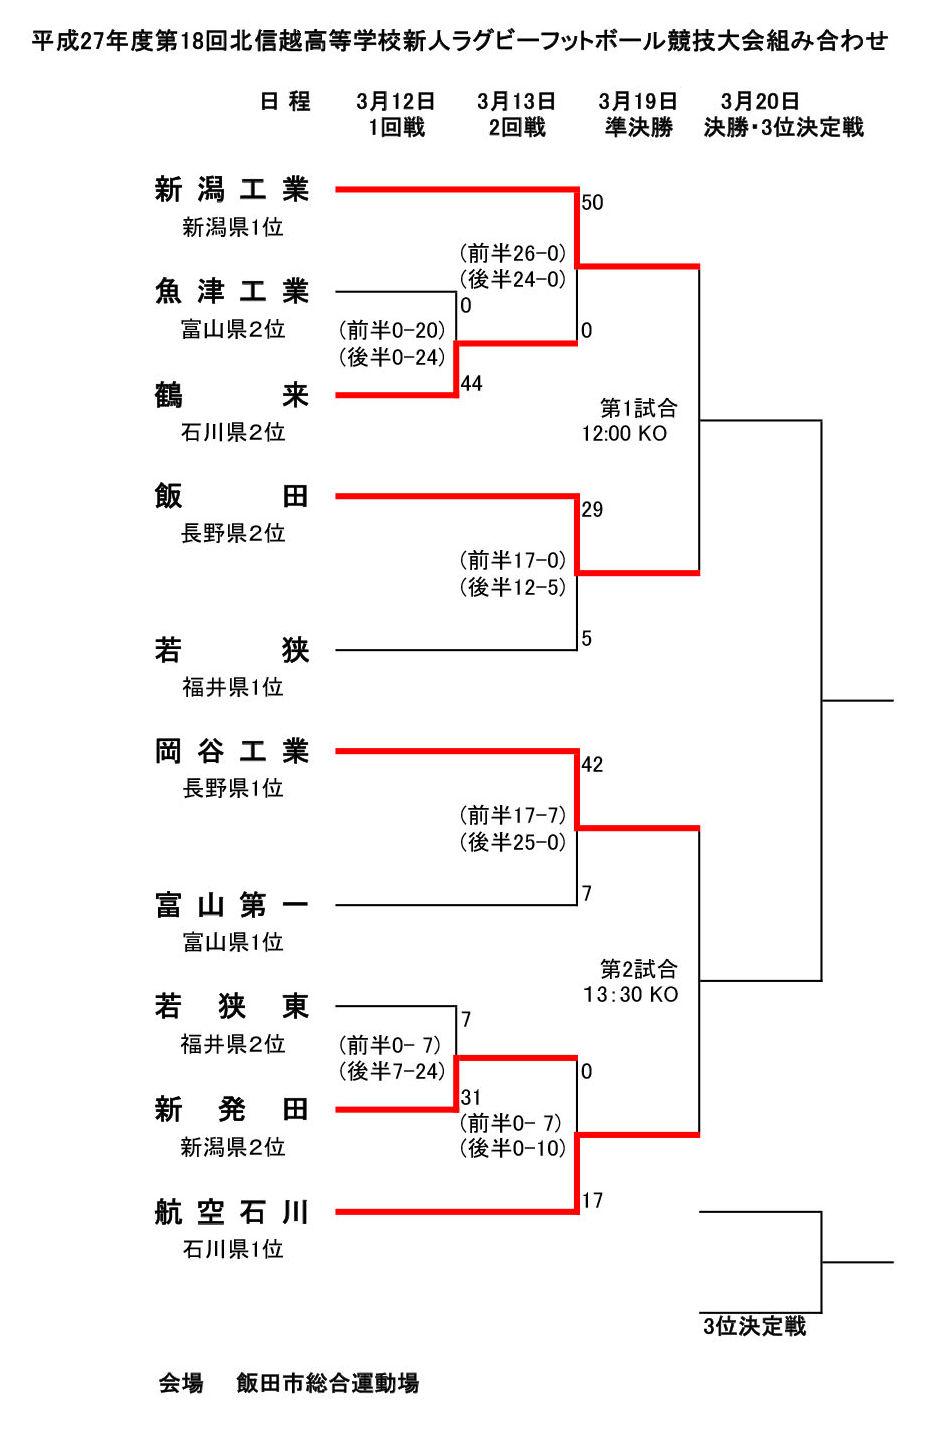 H27-hokushinetsu-20160316.jpg